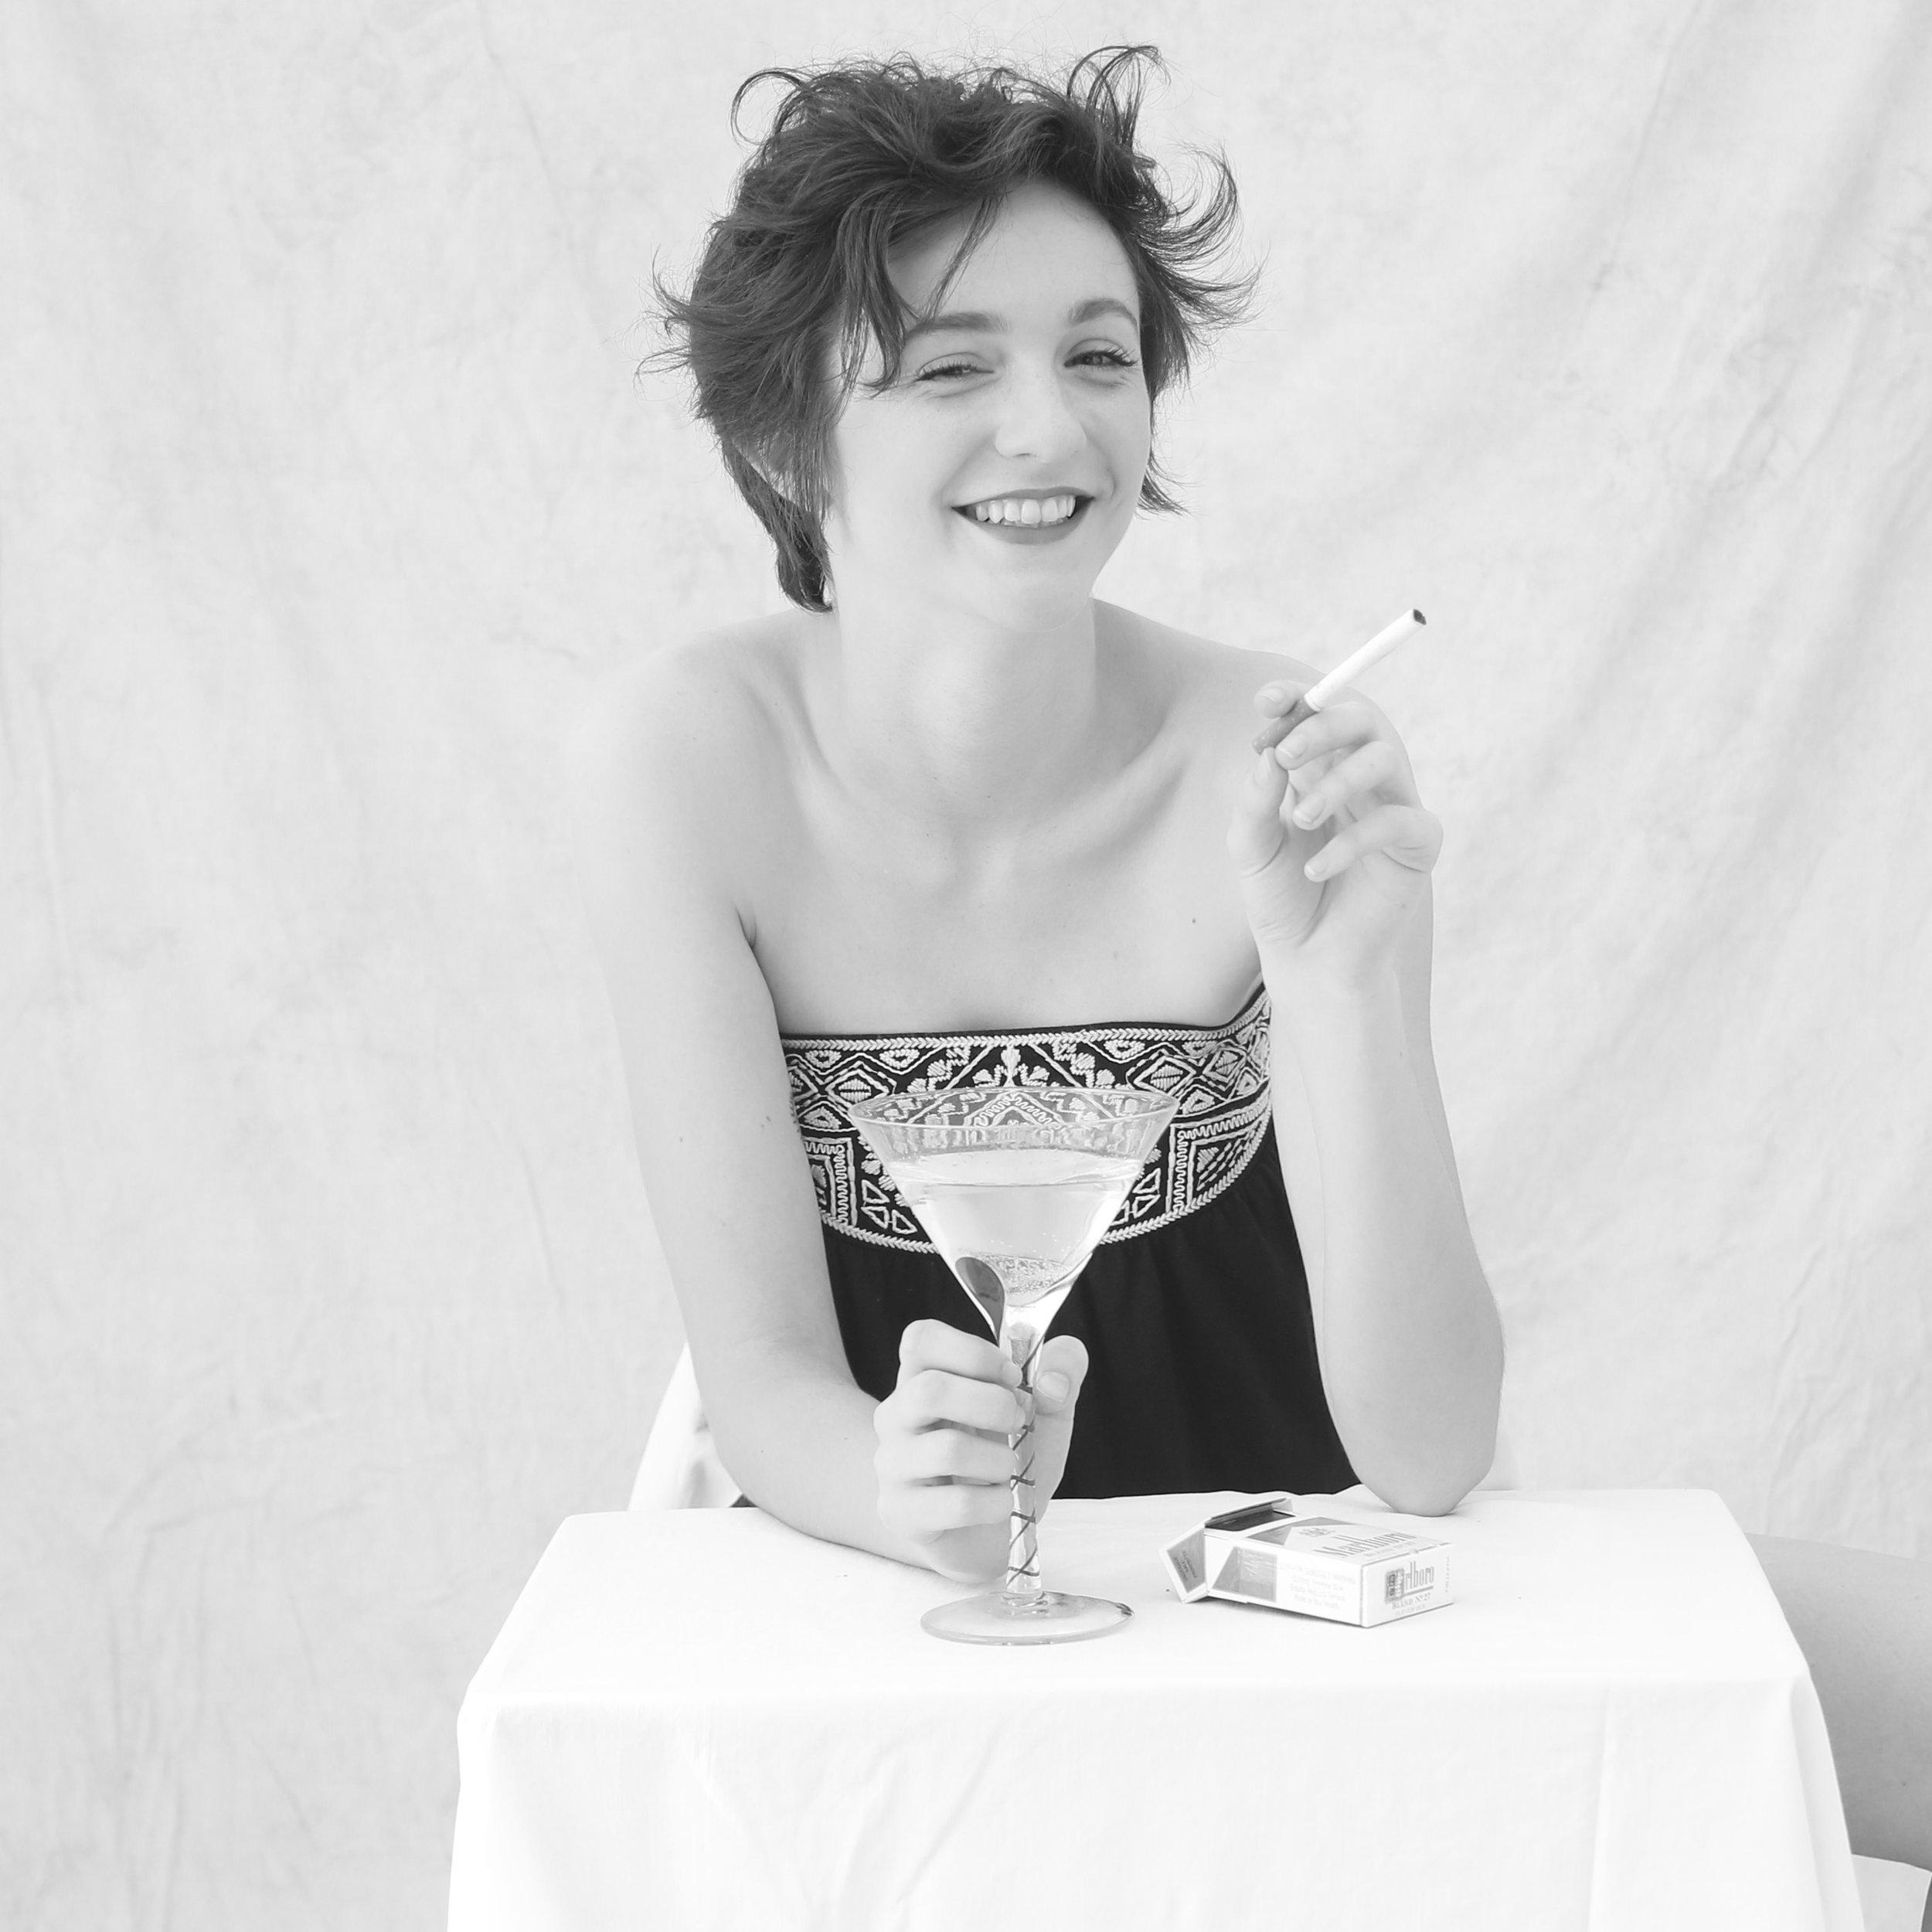 Girl With Martini.jpg